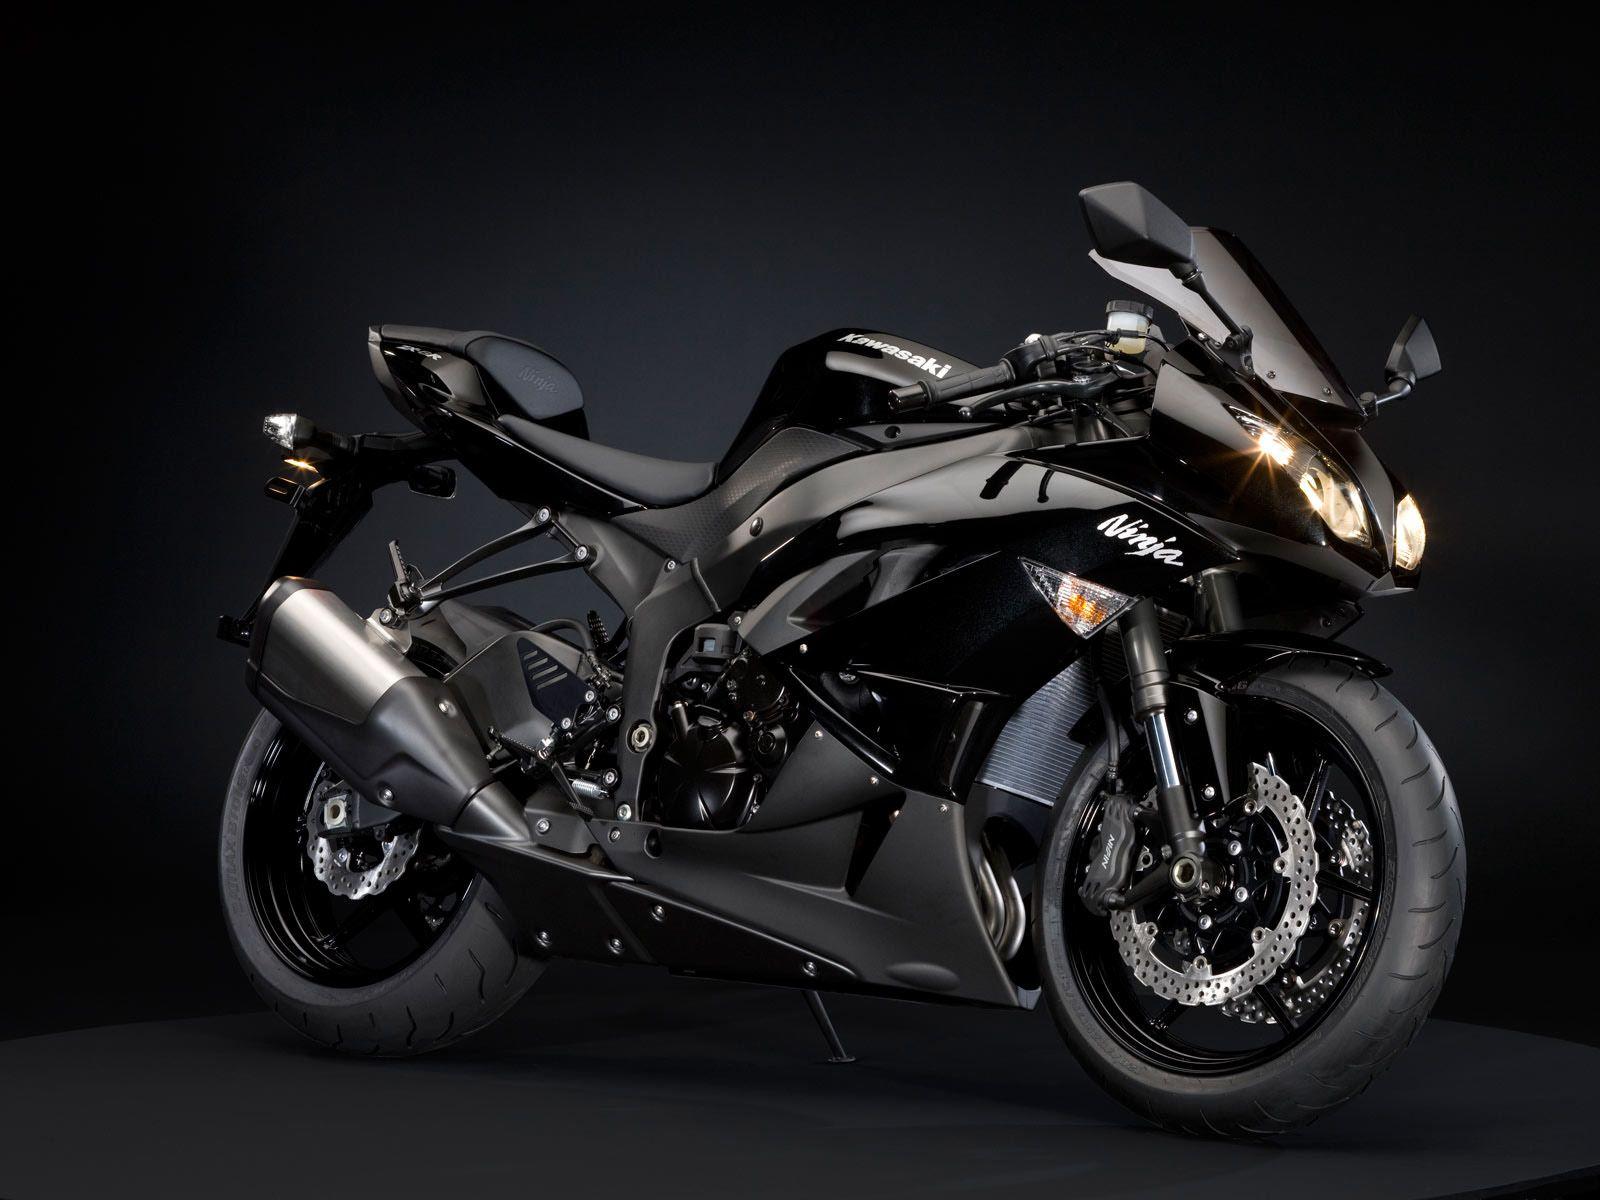 Harga Motor Atv Kawasaki